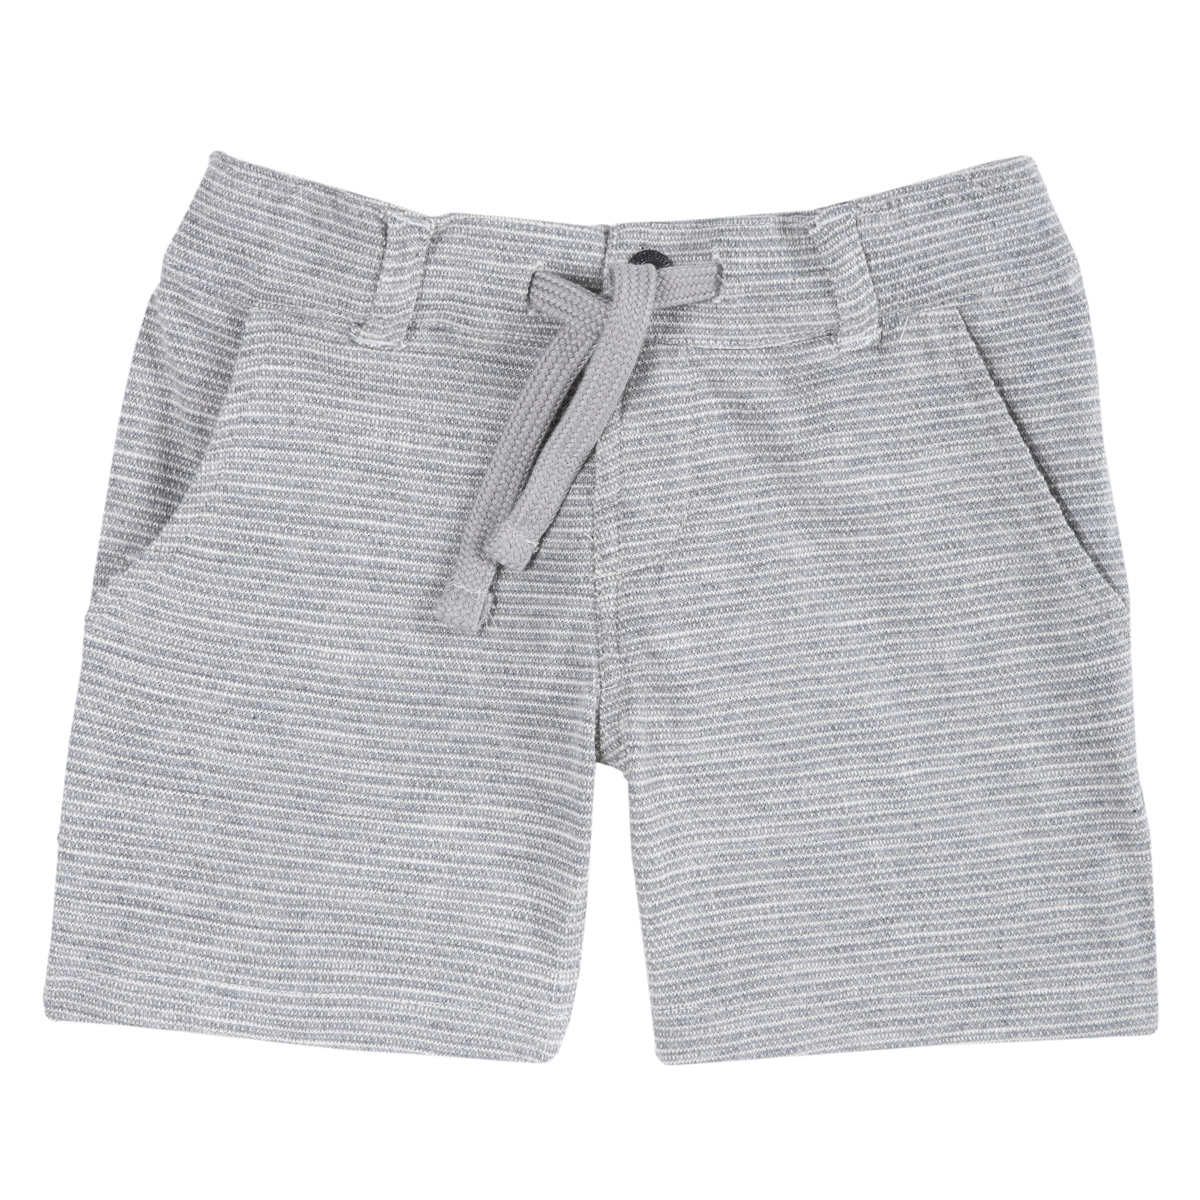 Pantalon Scurt Copii Chicco, Gri Inchis, 52728